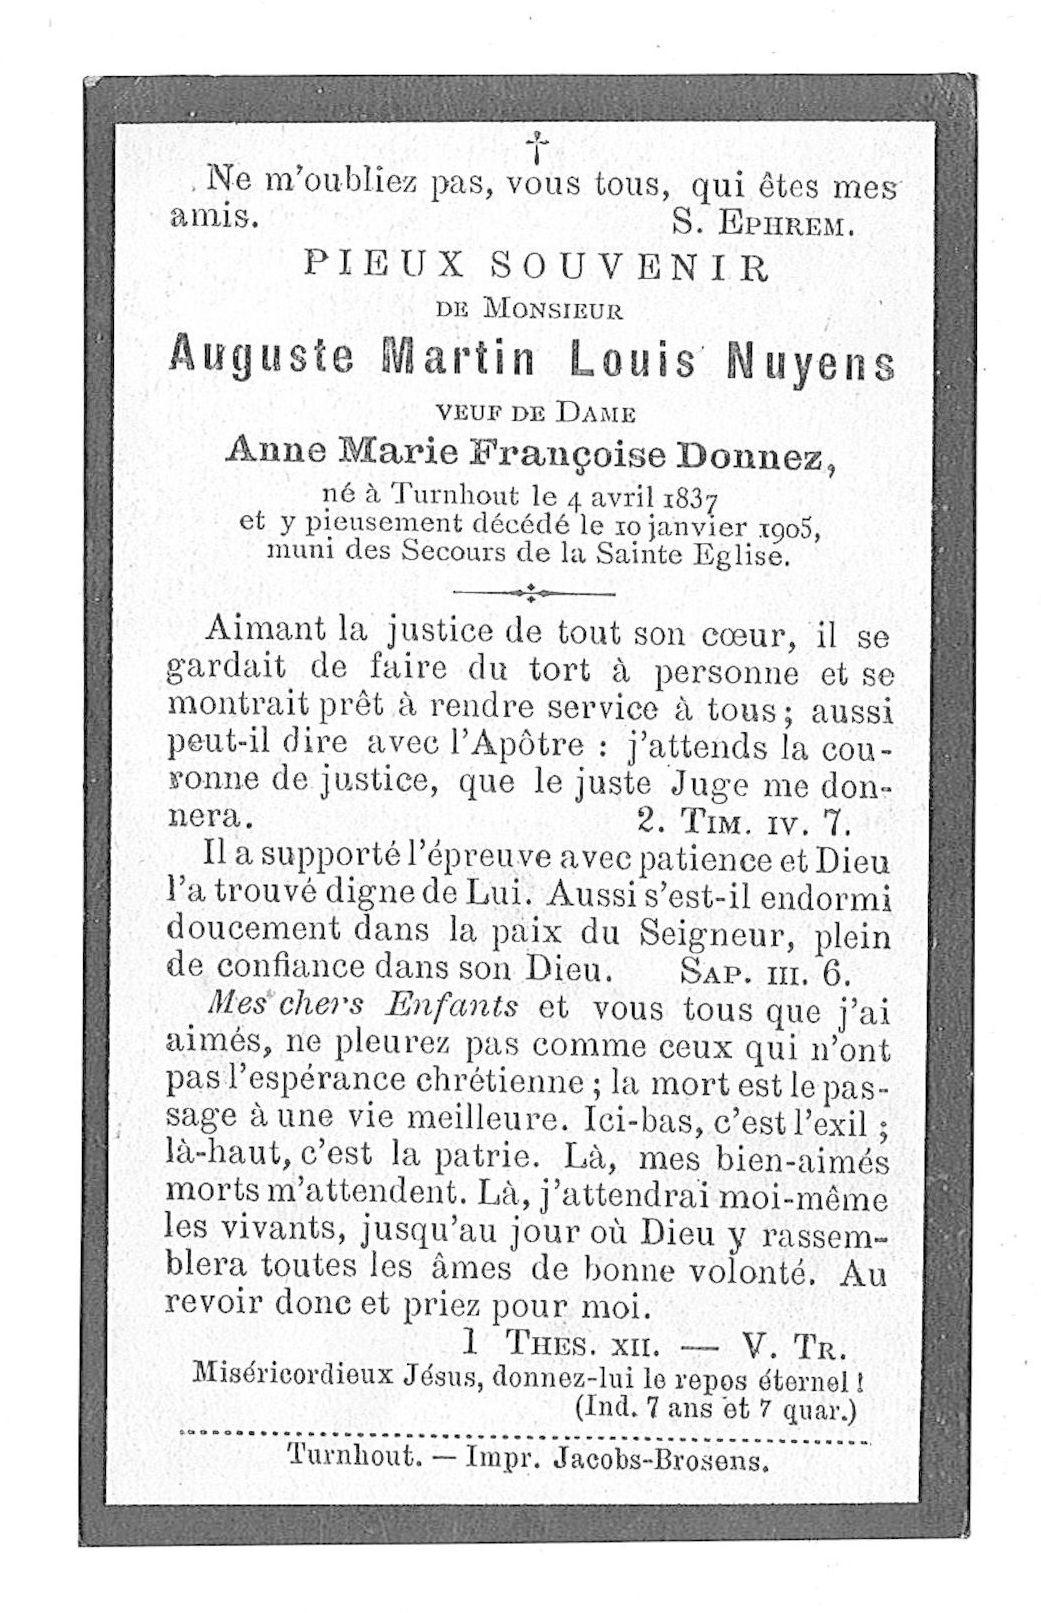 Auguste-Martin-Louis Nuyens